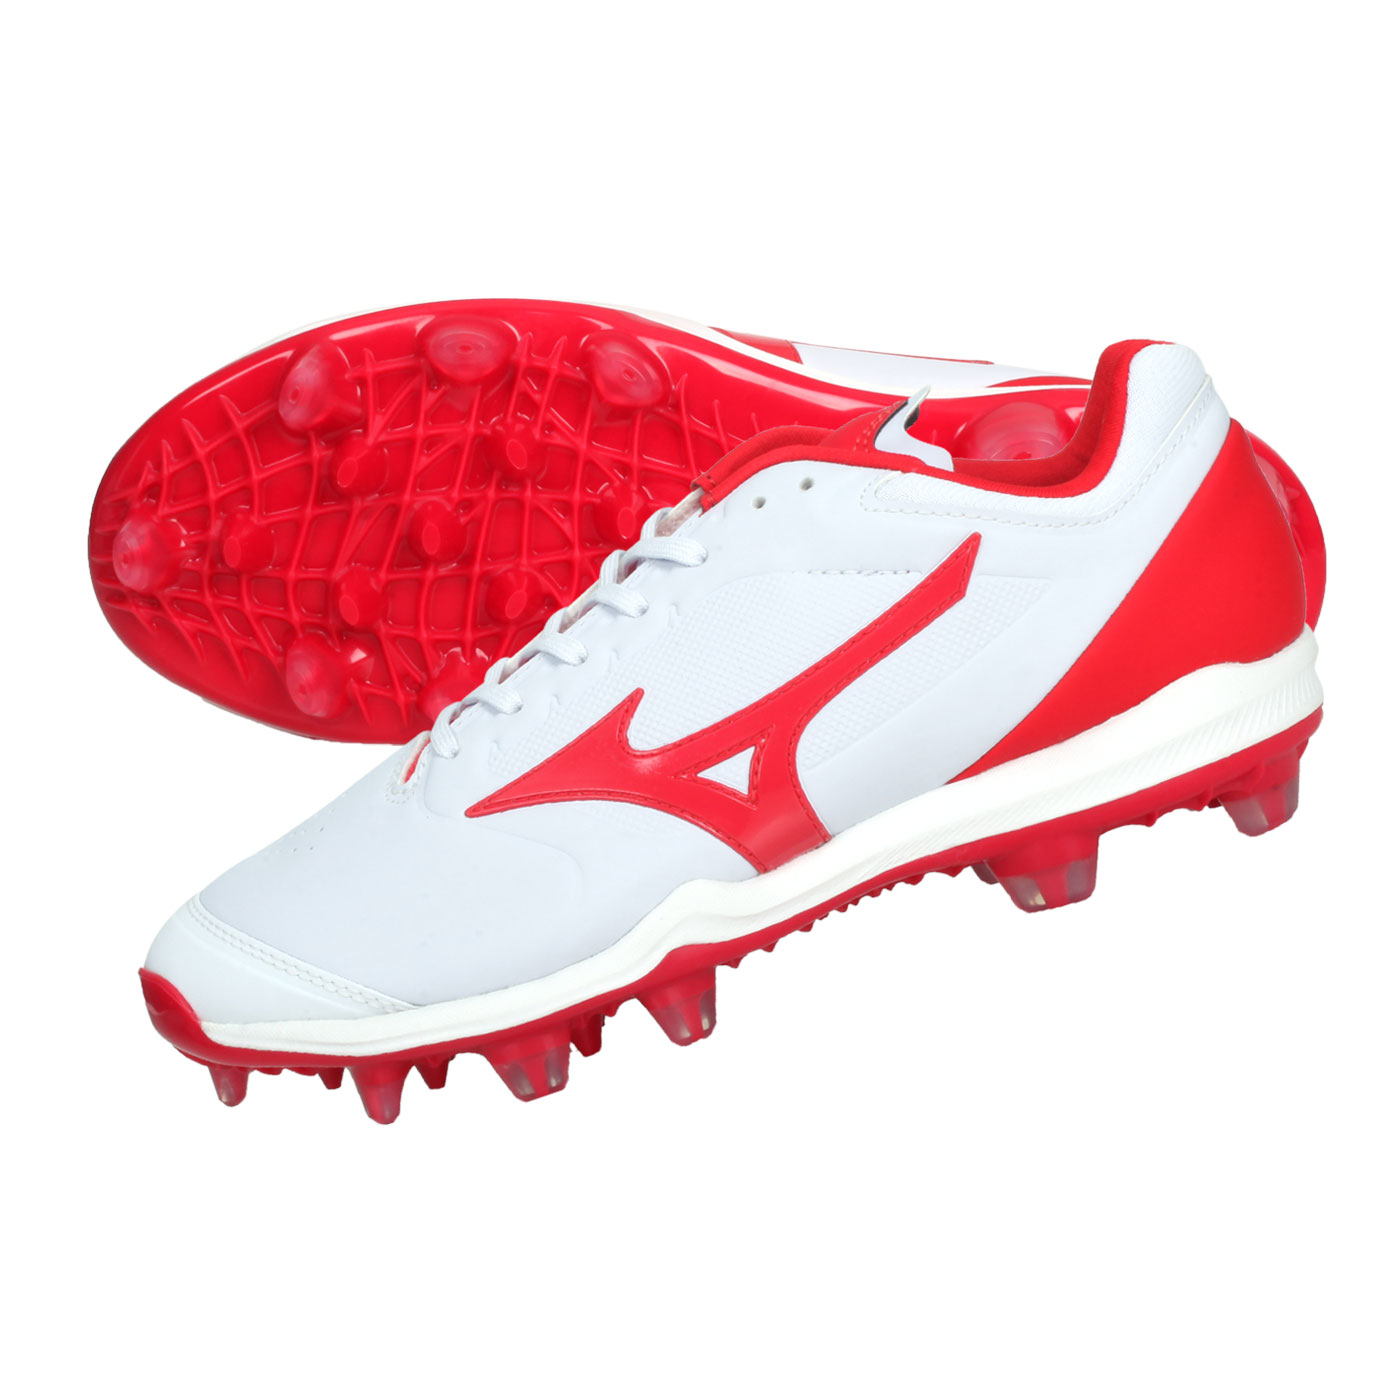 MIZUNO 棒壘膠釘鞋  @DOMINANT 3 TPU@11GP202262 - 白紅